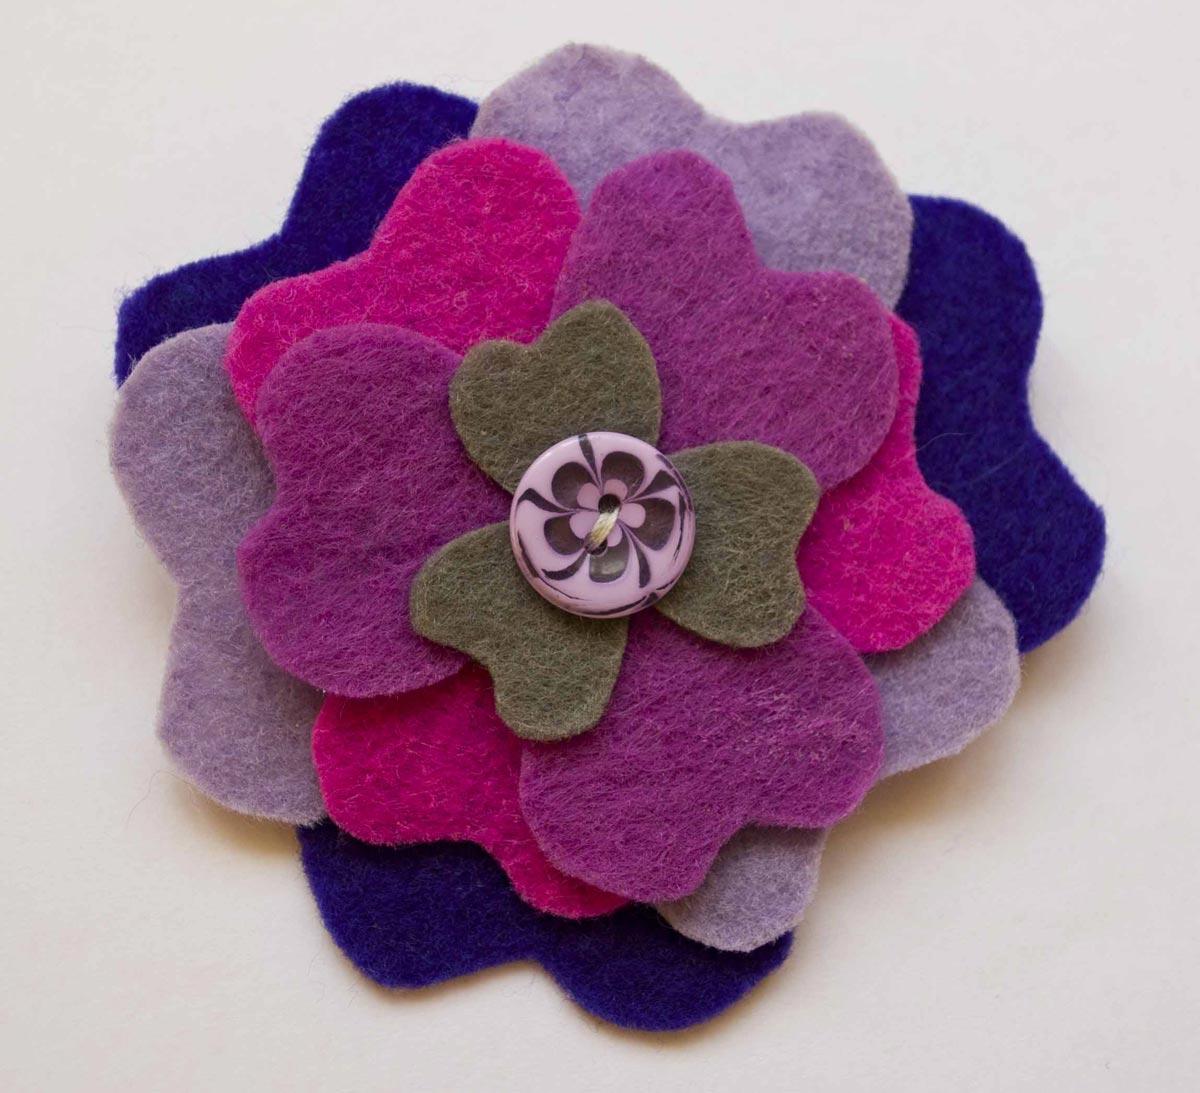 Необычный плоский цветок. Фото с сайта minigift.ru